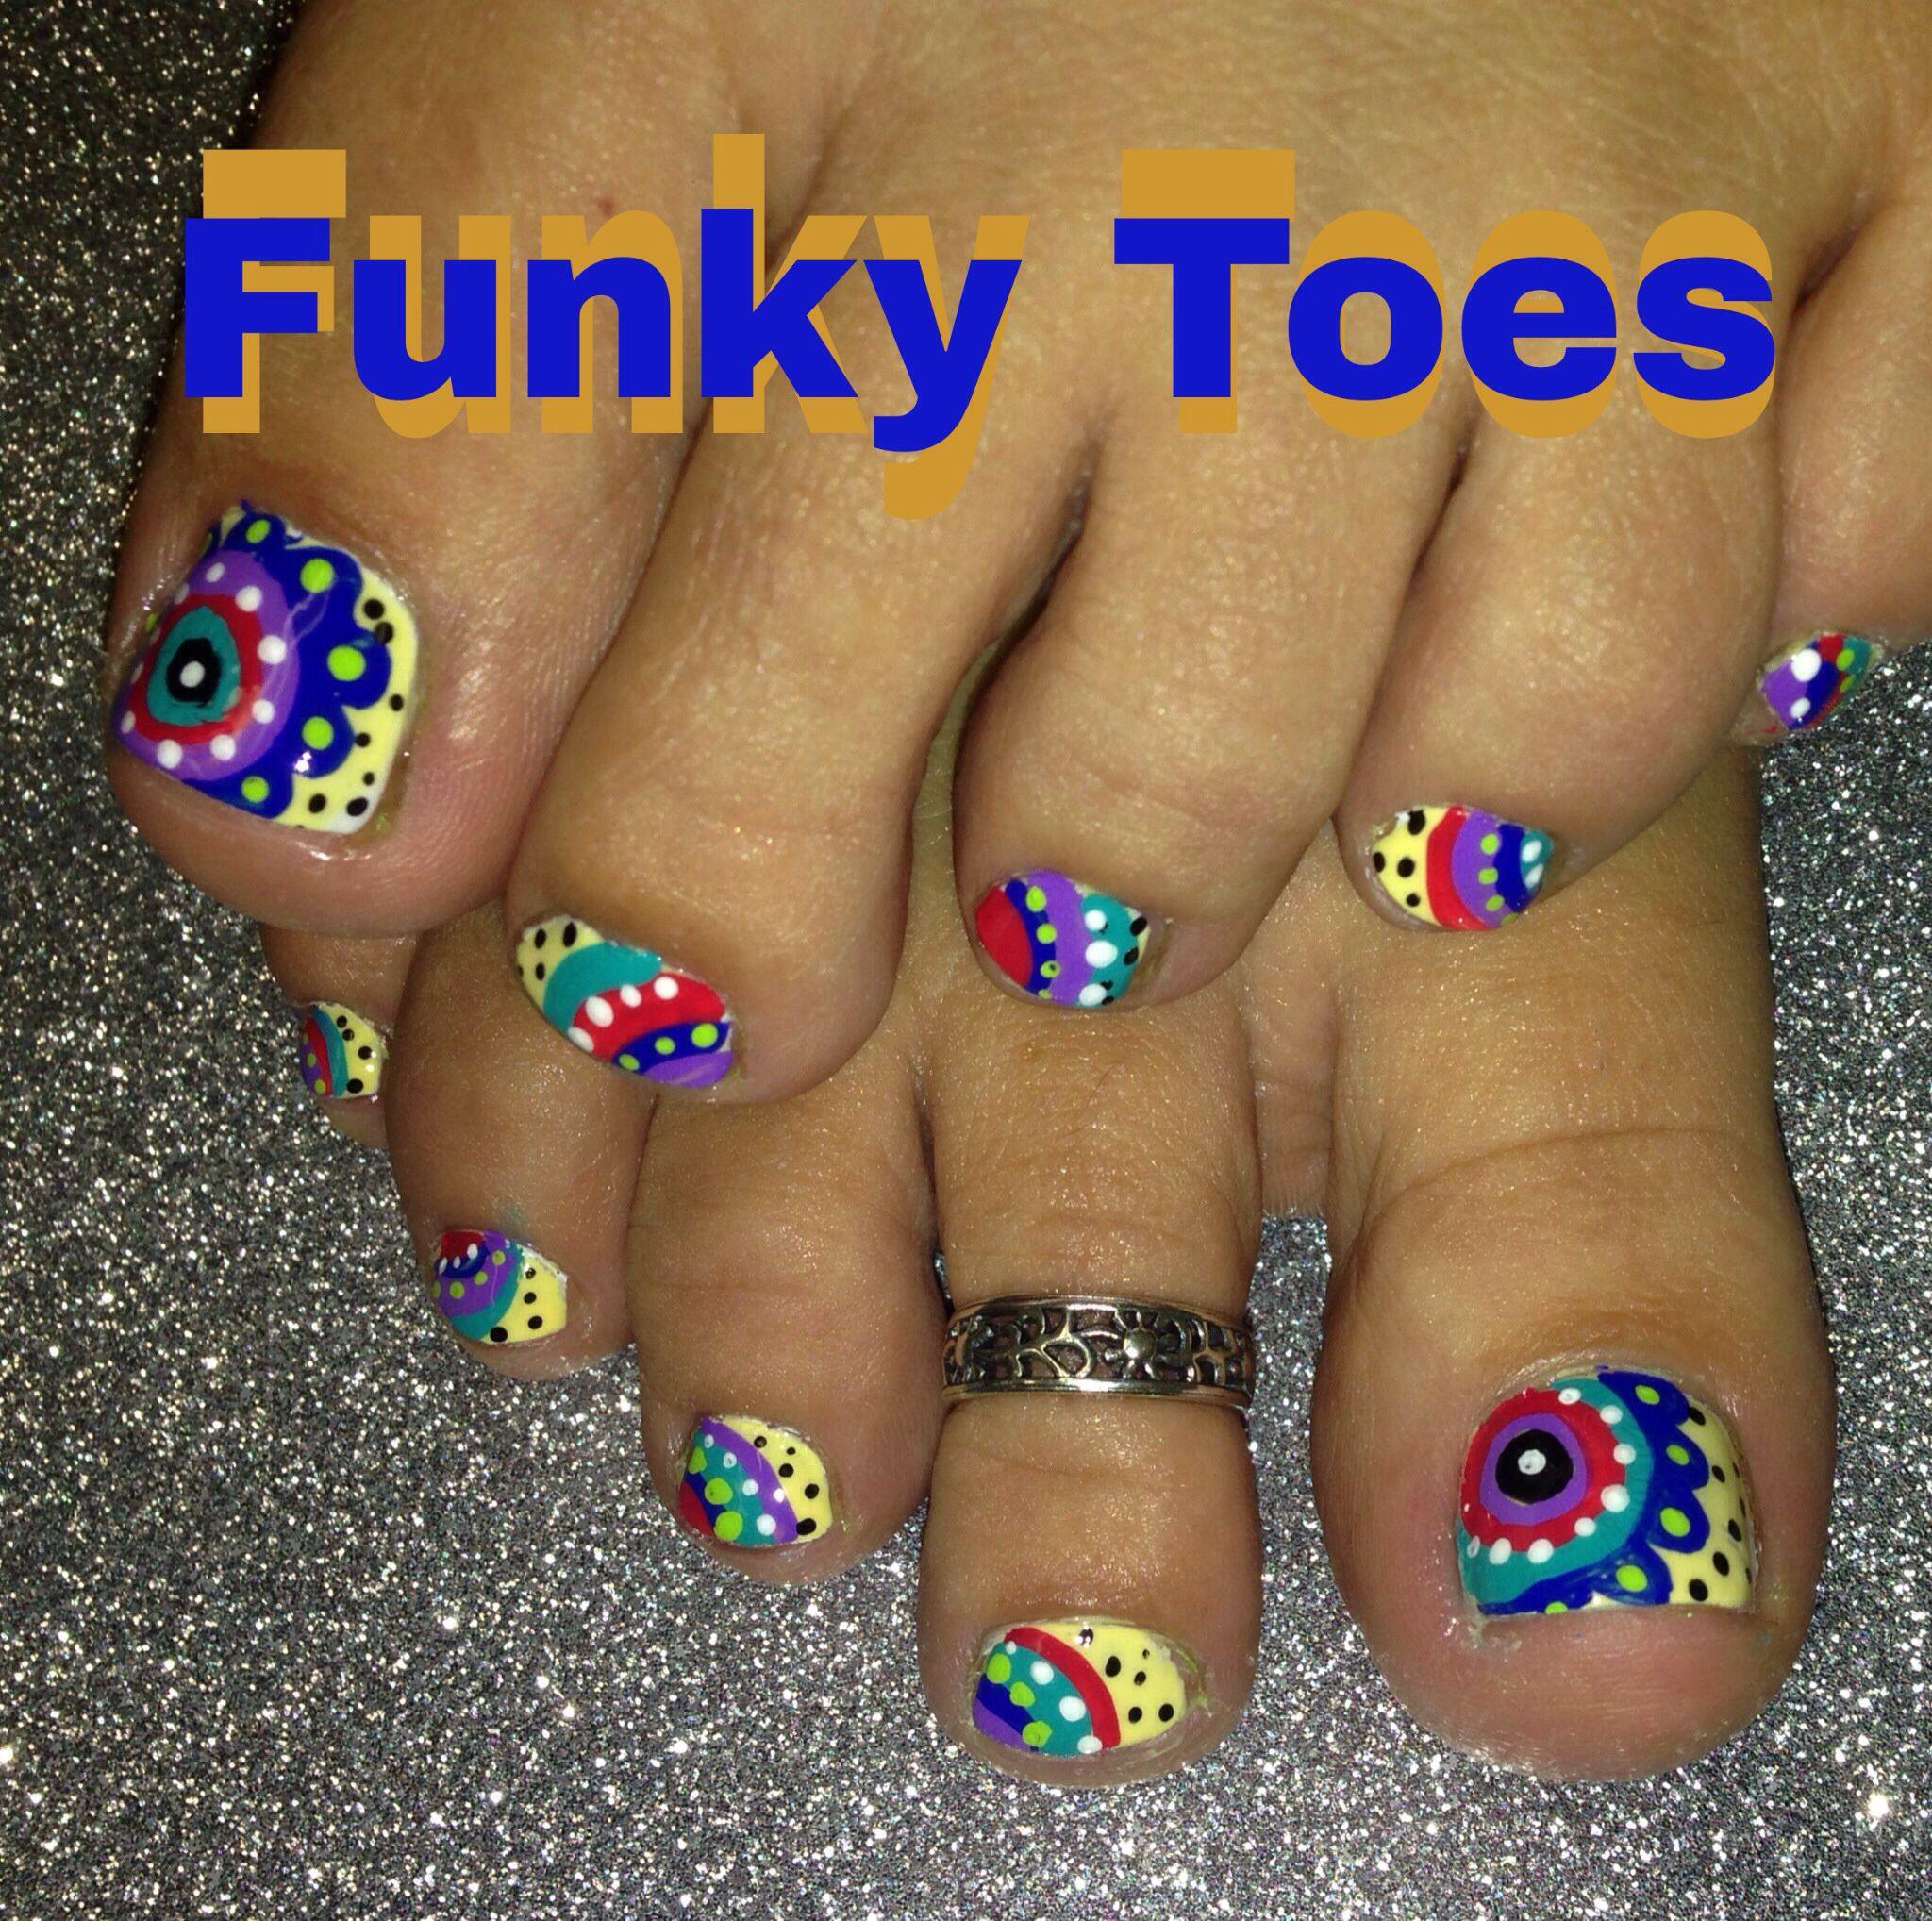 Nail art fun funky colors | nails | Pinterest | Pedicures, Toe nail ...